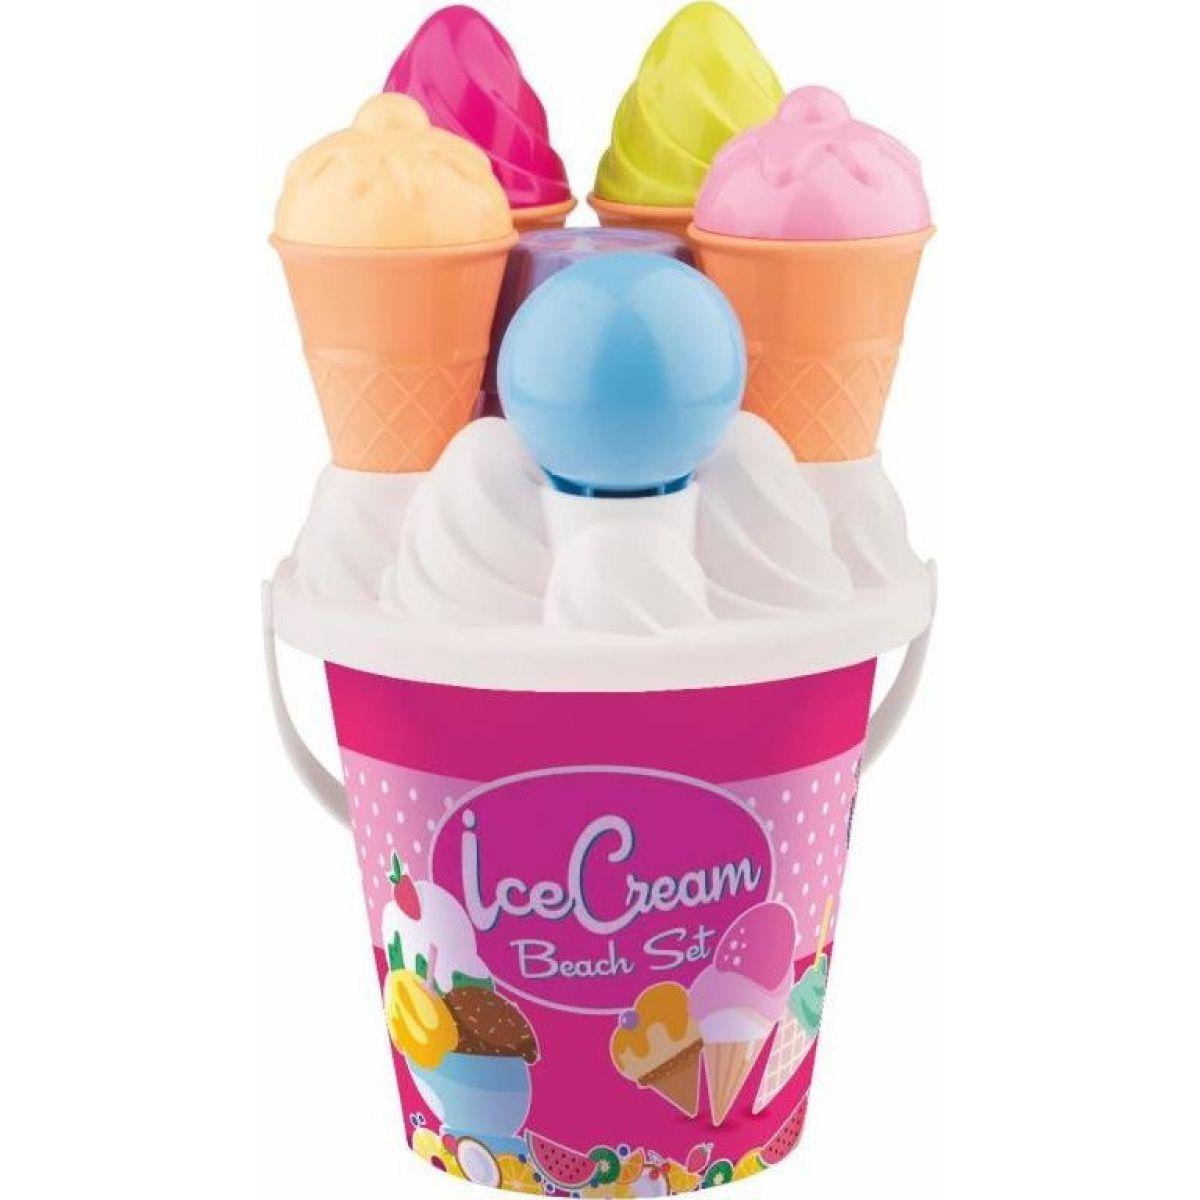 Sada na písek zmrzlina a cup cake růžový kyblík